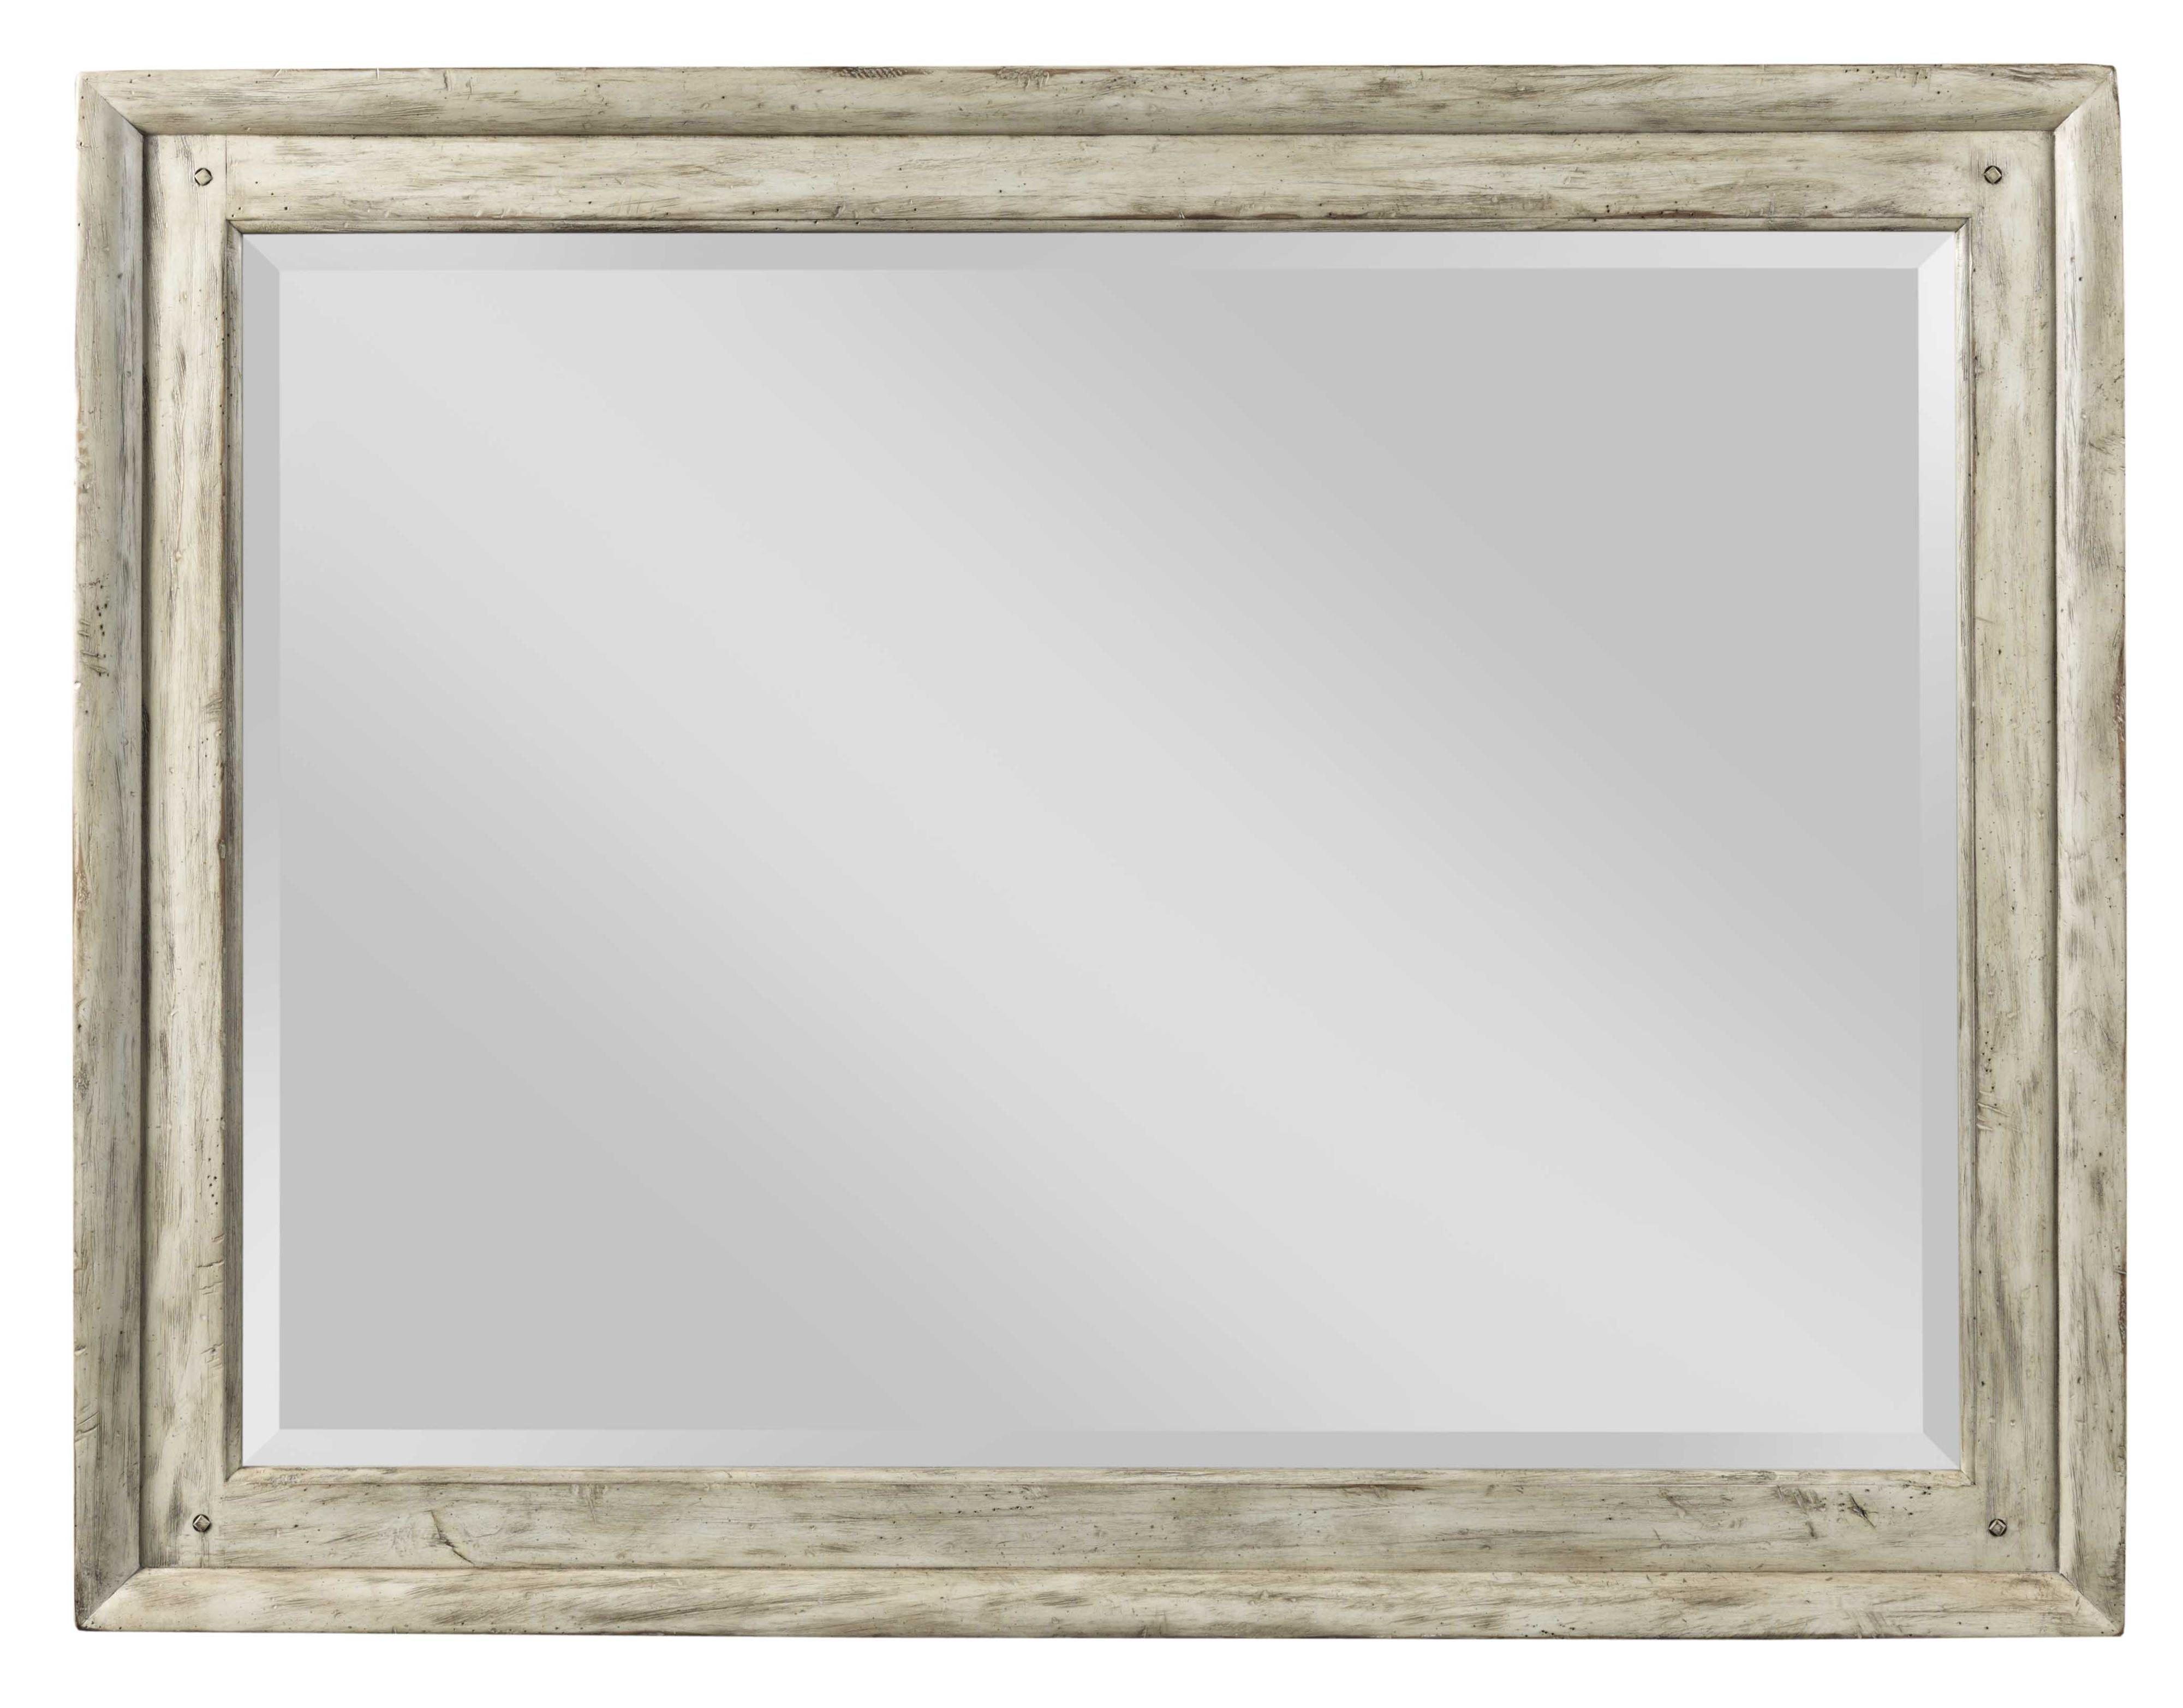 Kincaid Furniture Weatherford Landscape Mirror - Item Number: 75-114